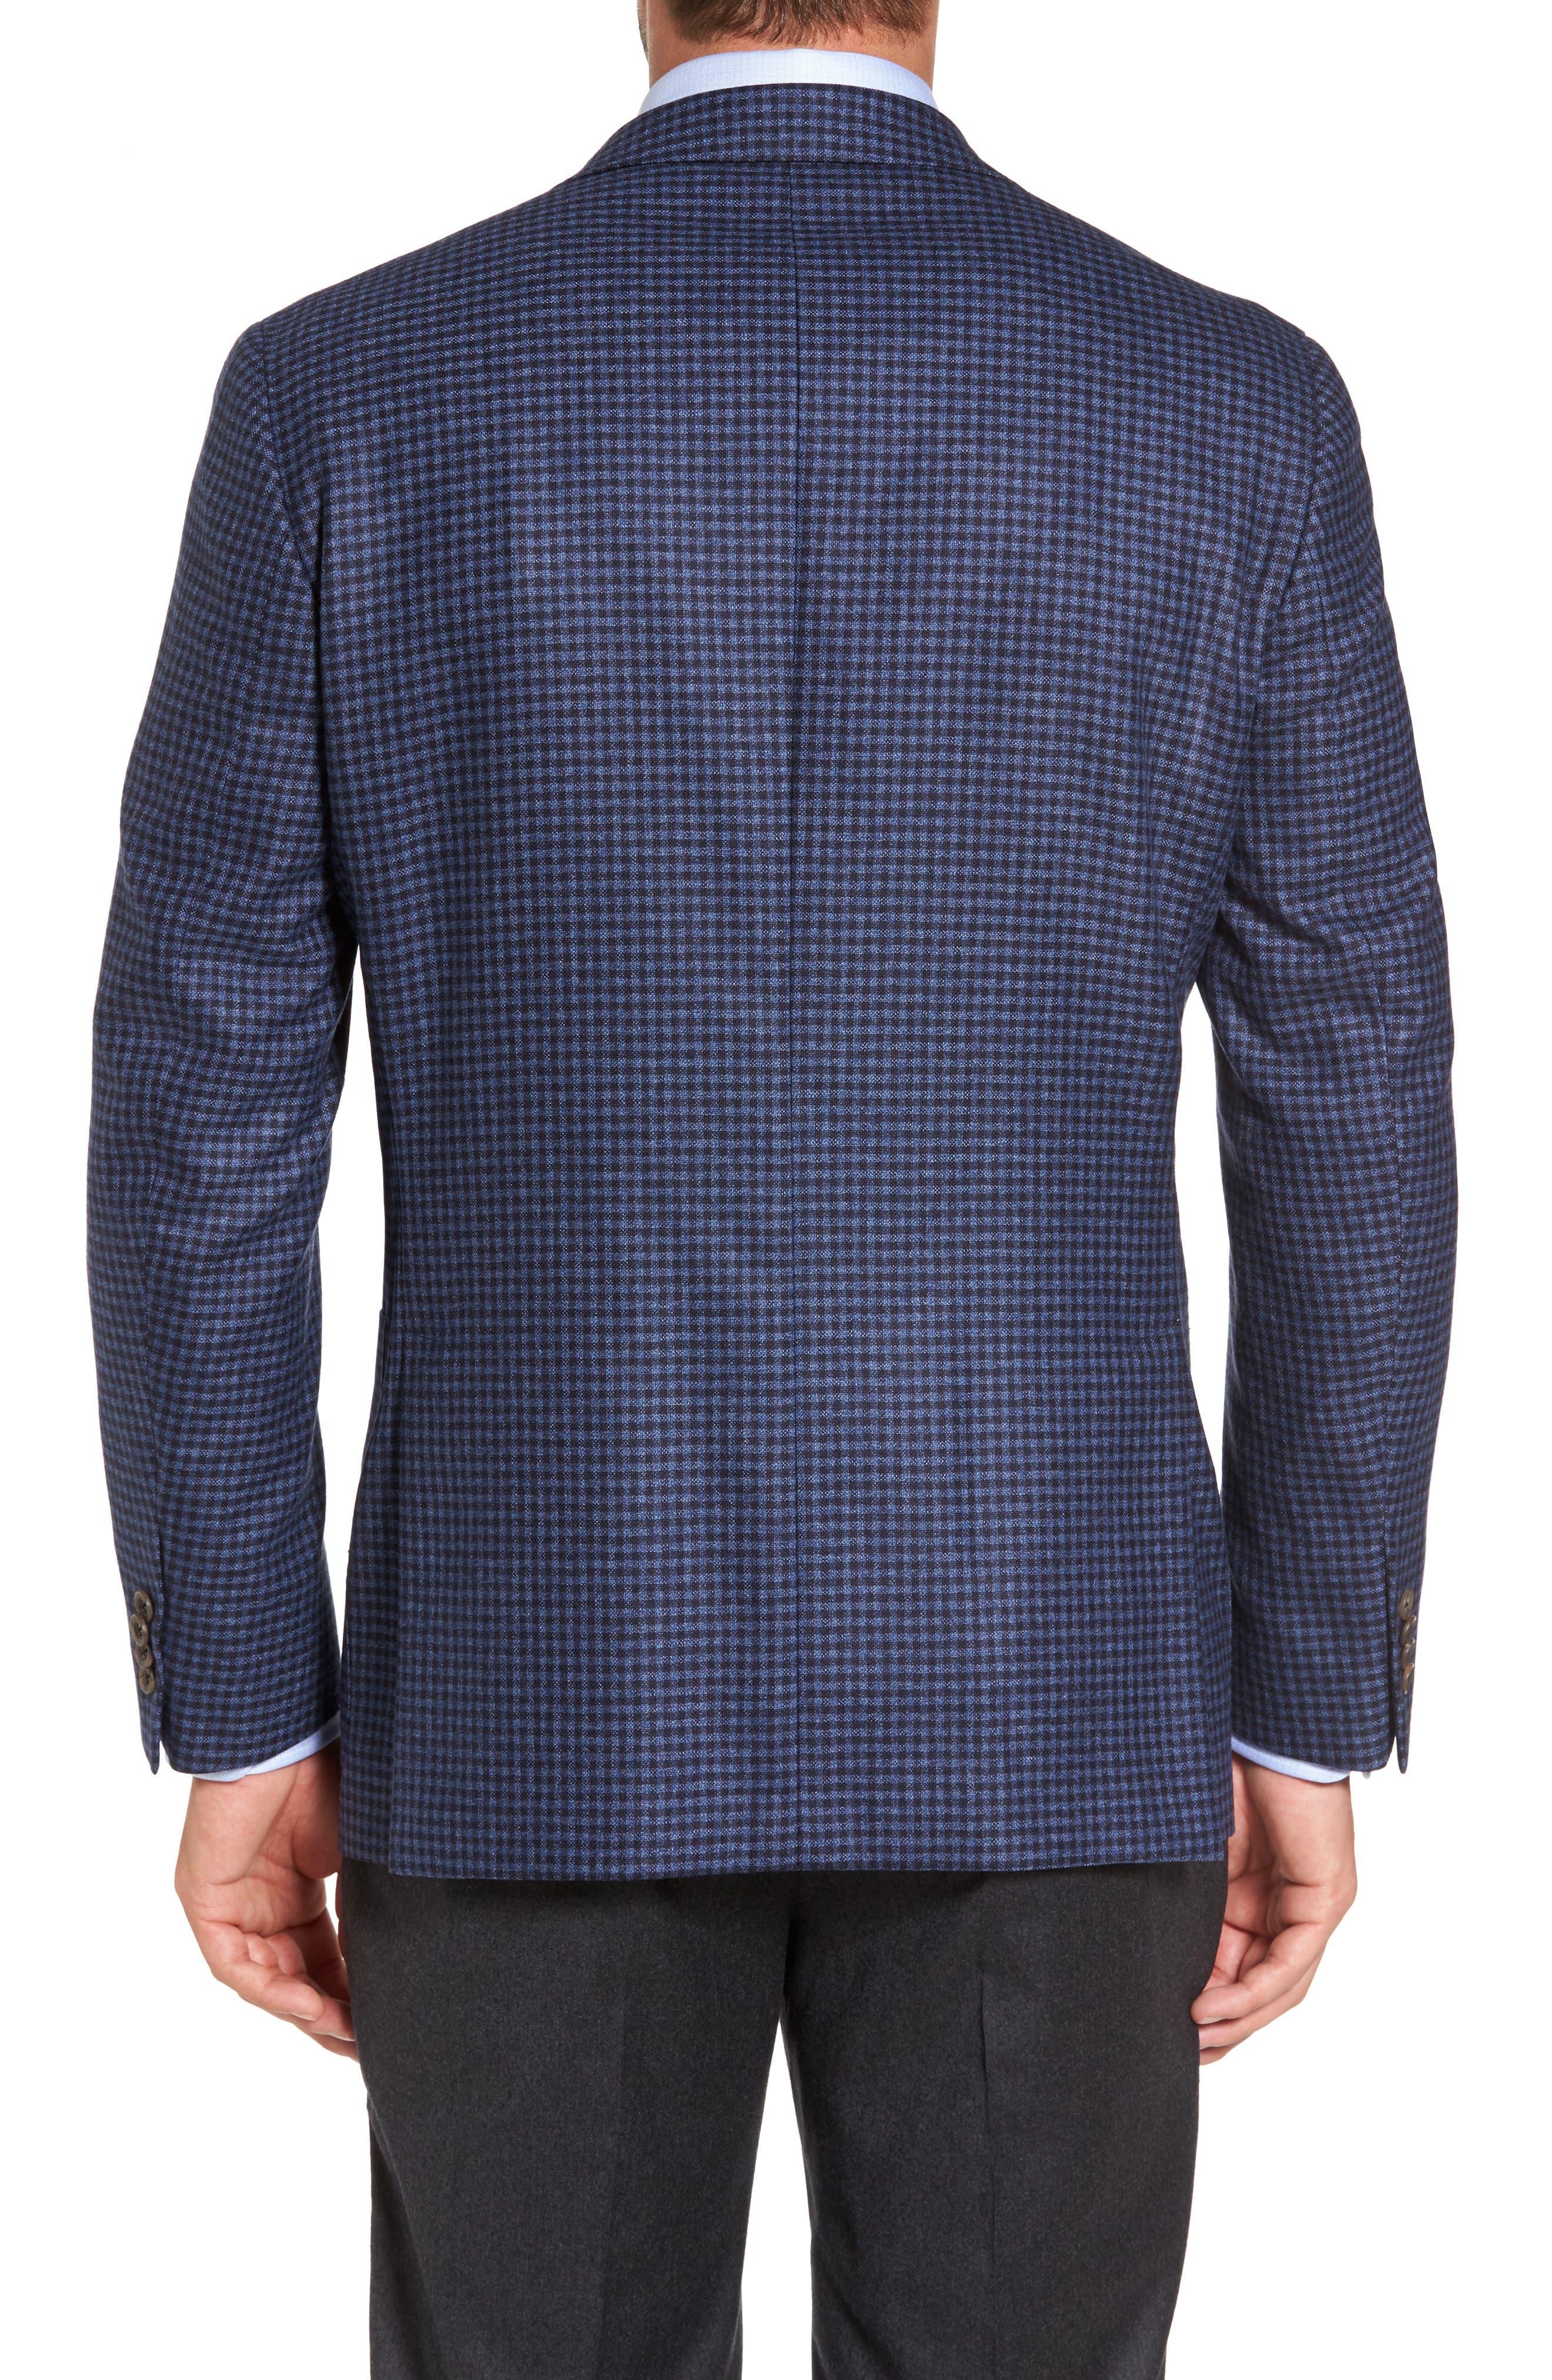 Aiden Classic Fit Check Wool & Cashmere Sport Coat,                             Alternate thumbnail 2, color,                             420